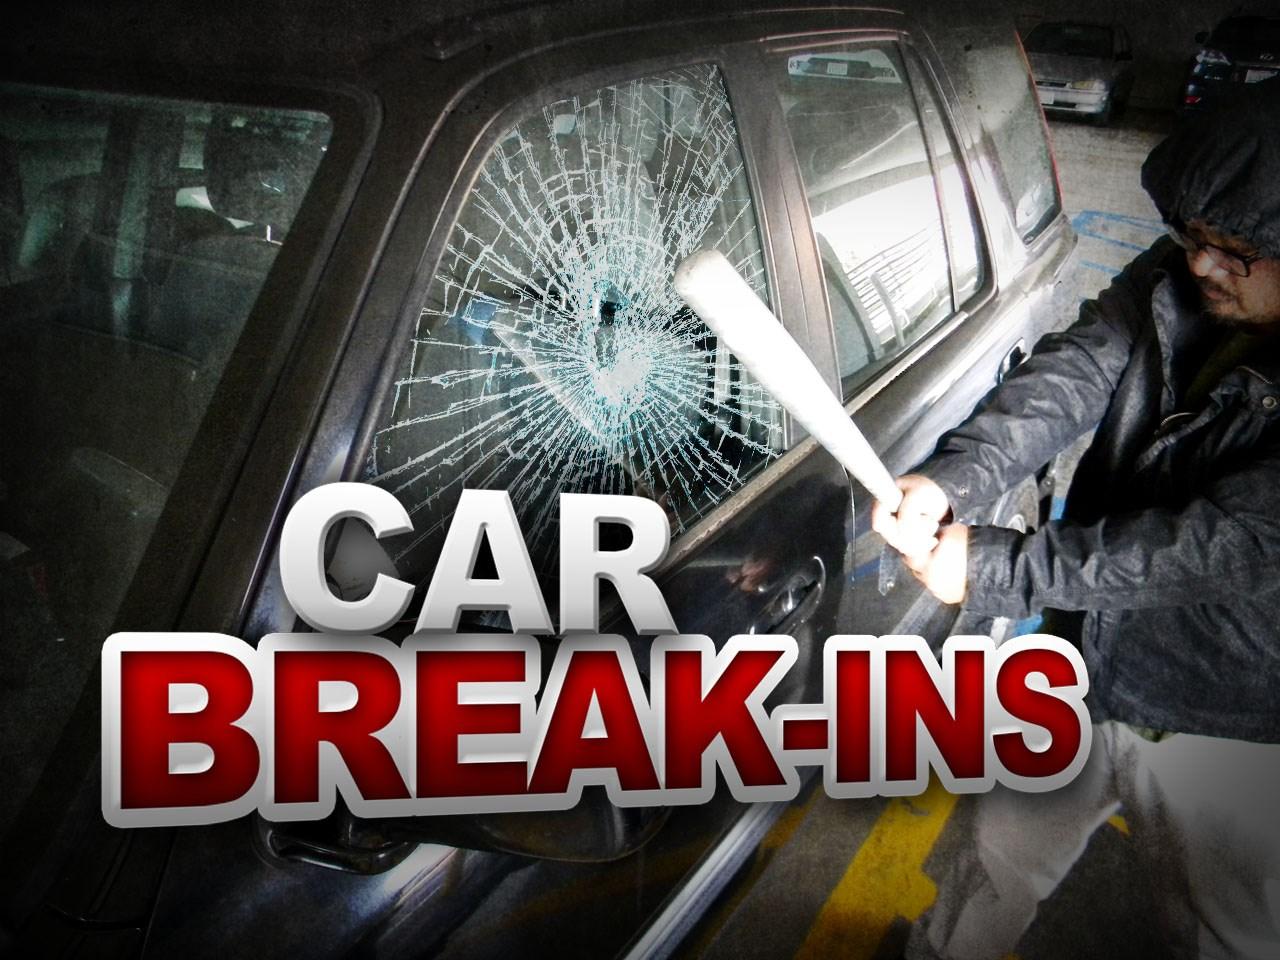 car break-ins.jpg